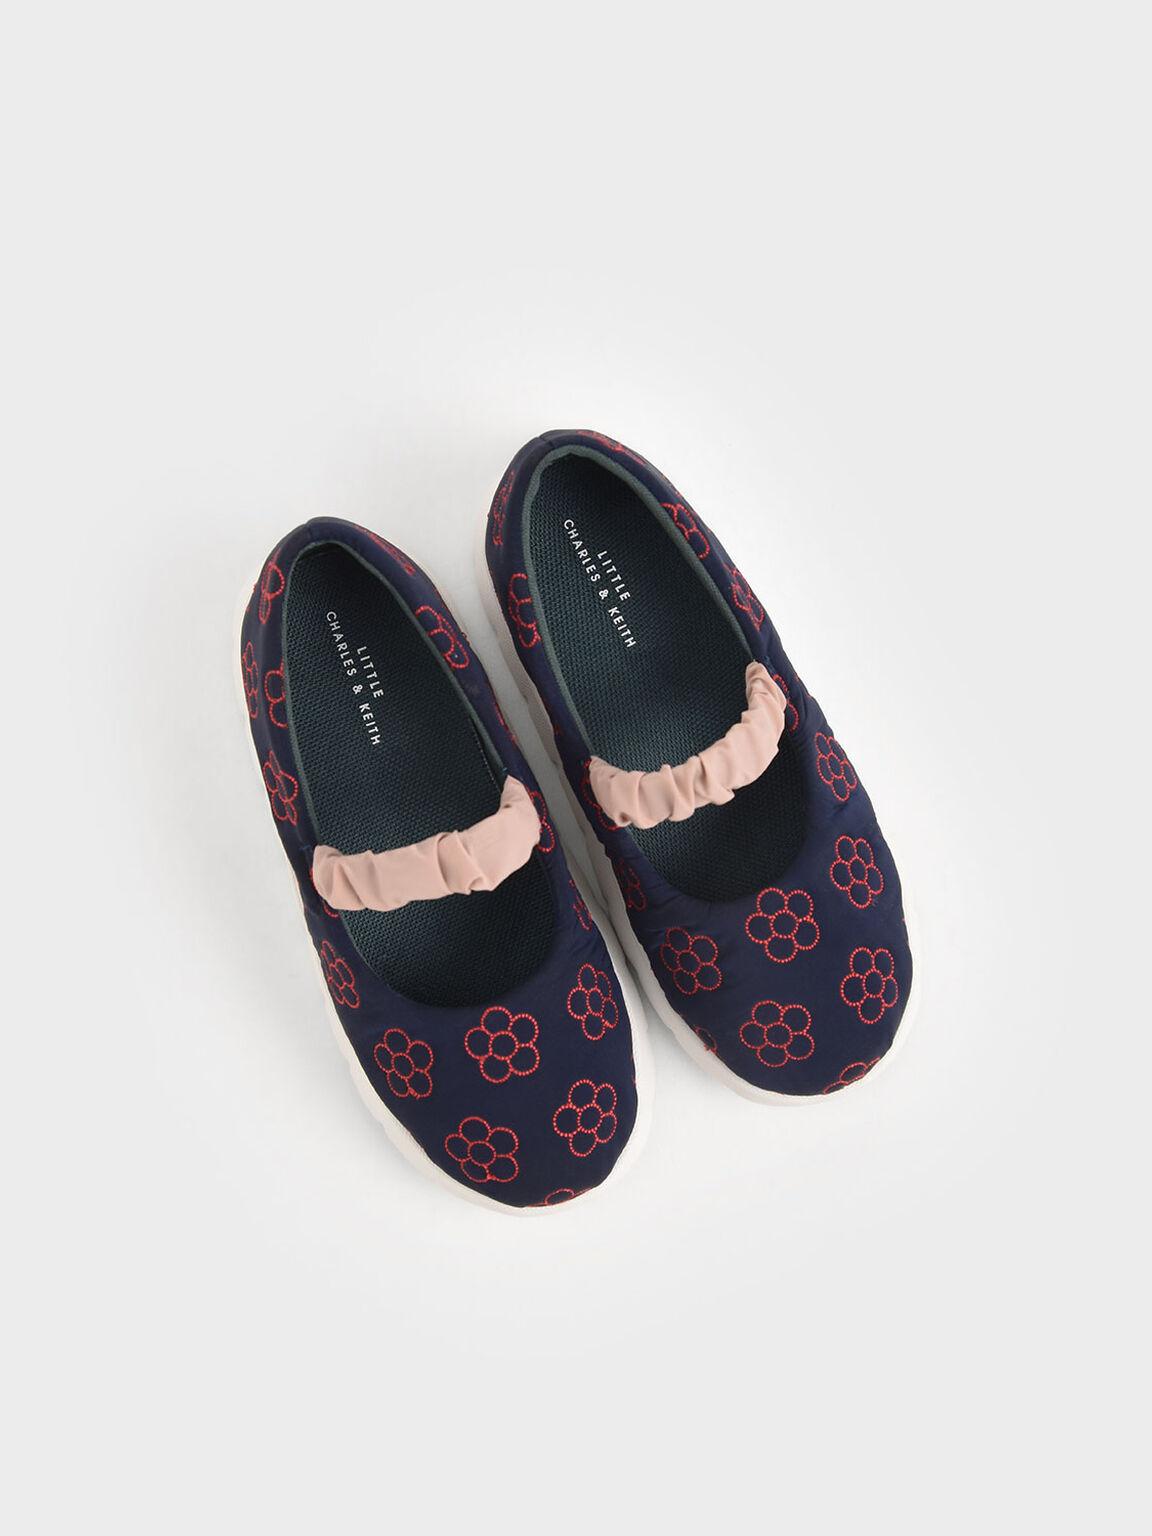 Girls' Printed Ruched Strap Slip-On Sneakers, Dark Blue, hi-res